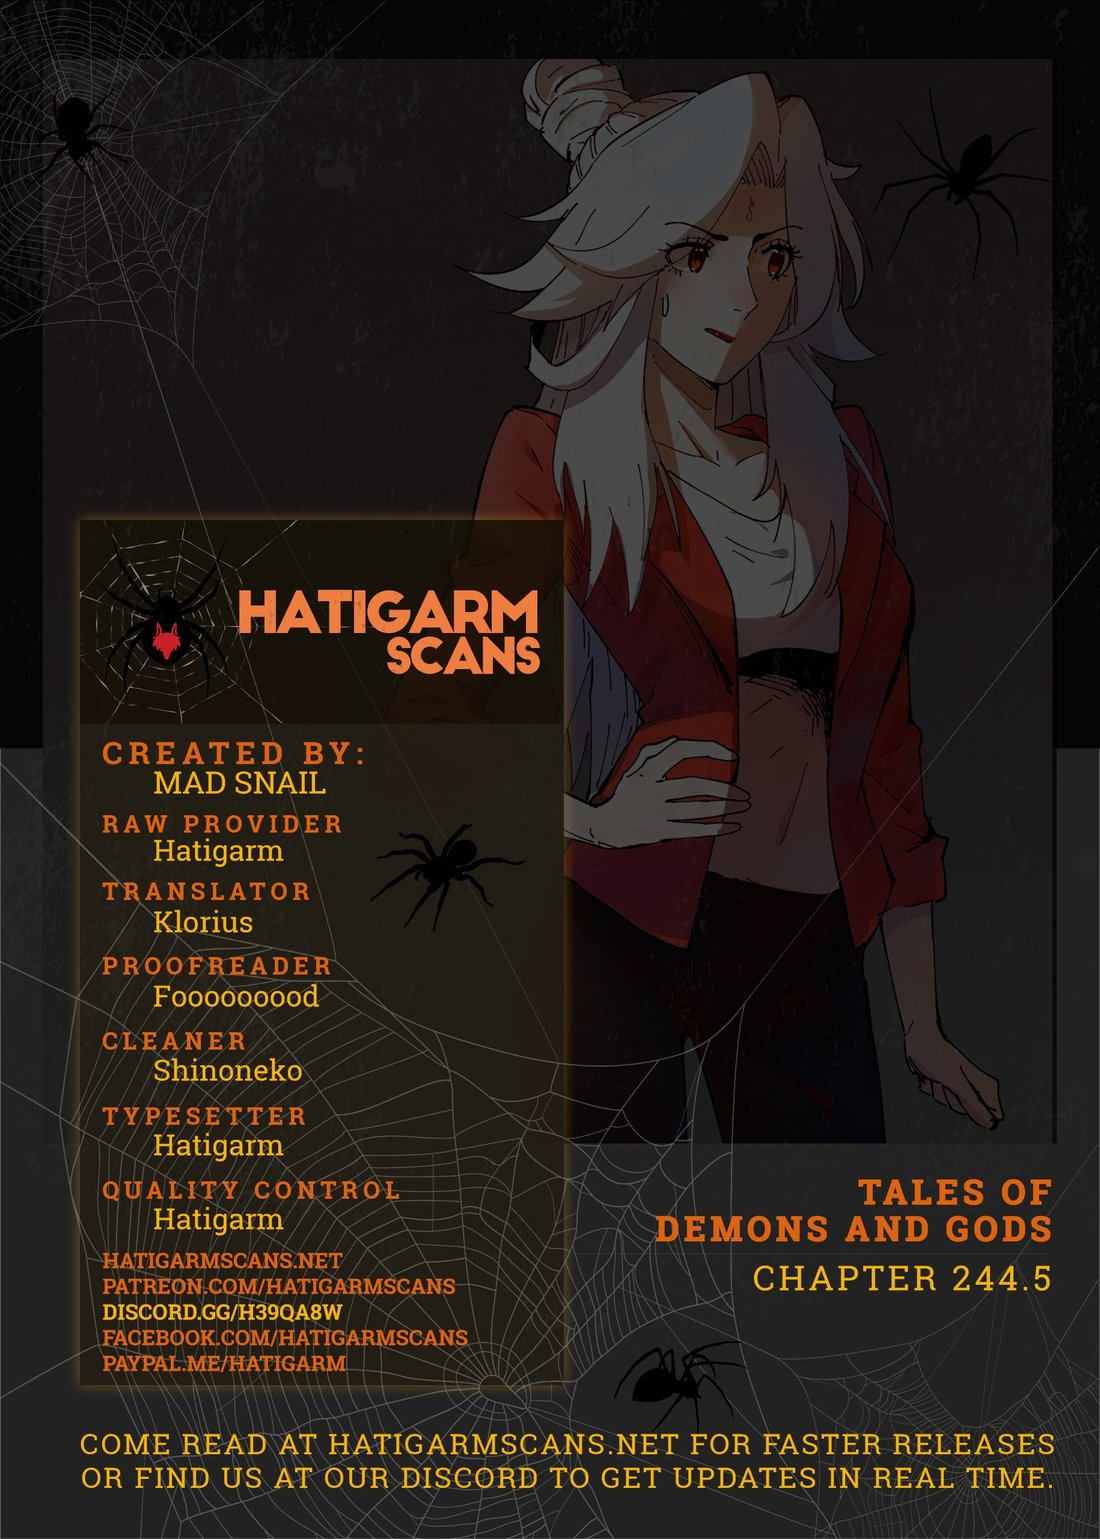 https://manga.mangadogs.com/comics/pic2/34/98/901714/f5a0cbdbb287728207a6f40ef3eecef4.jpg Page 1